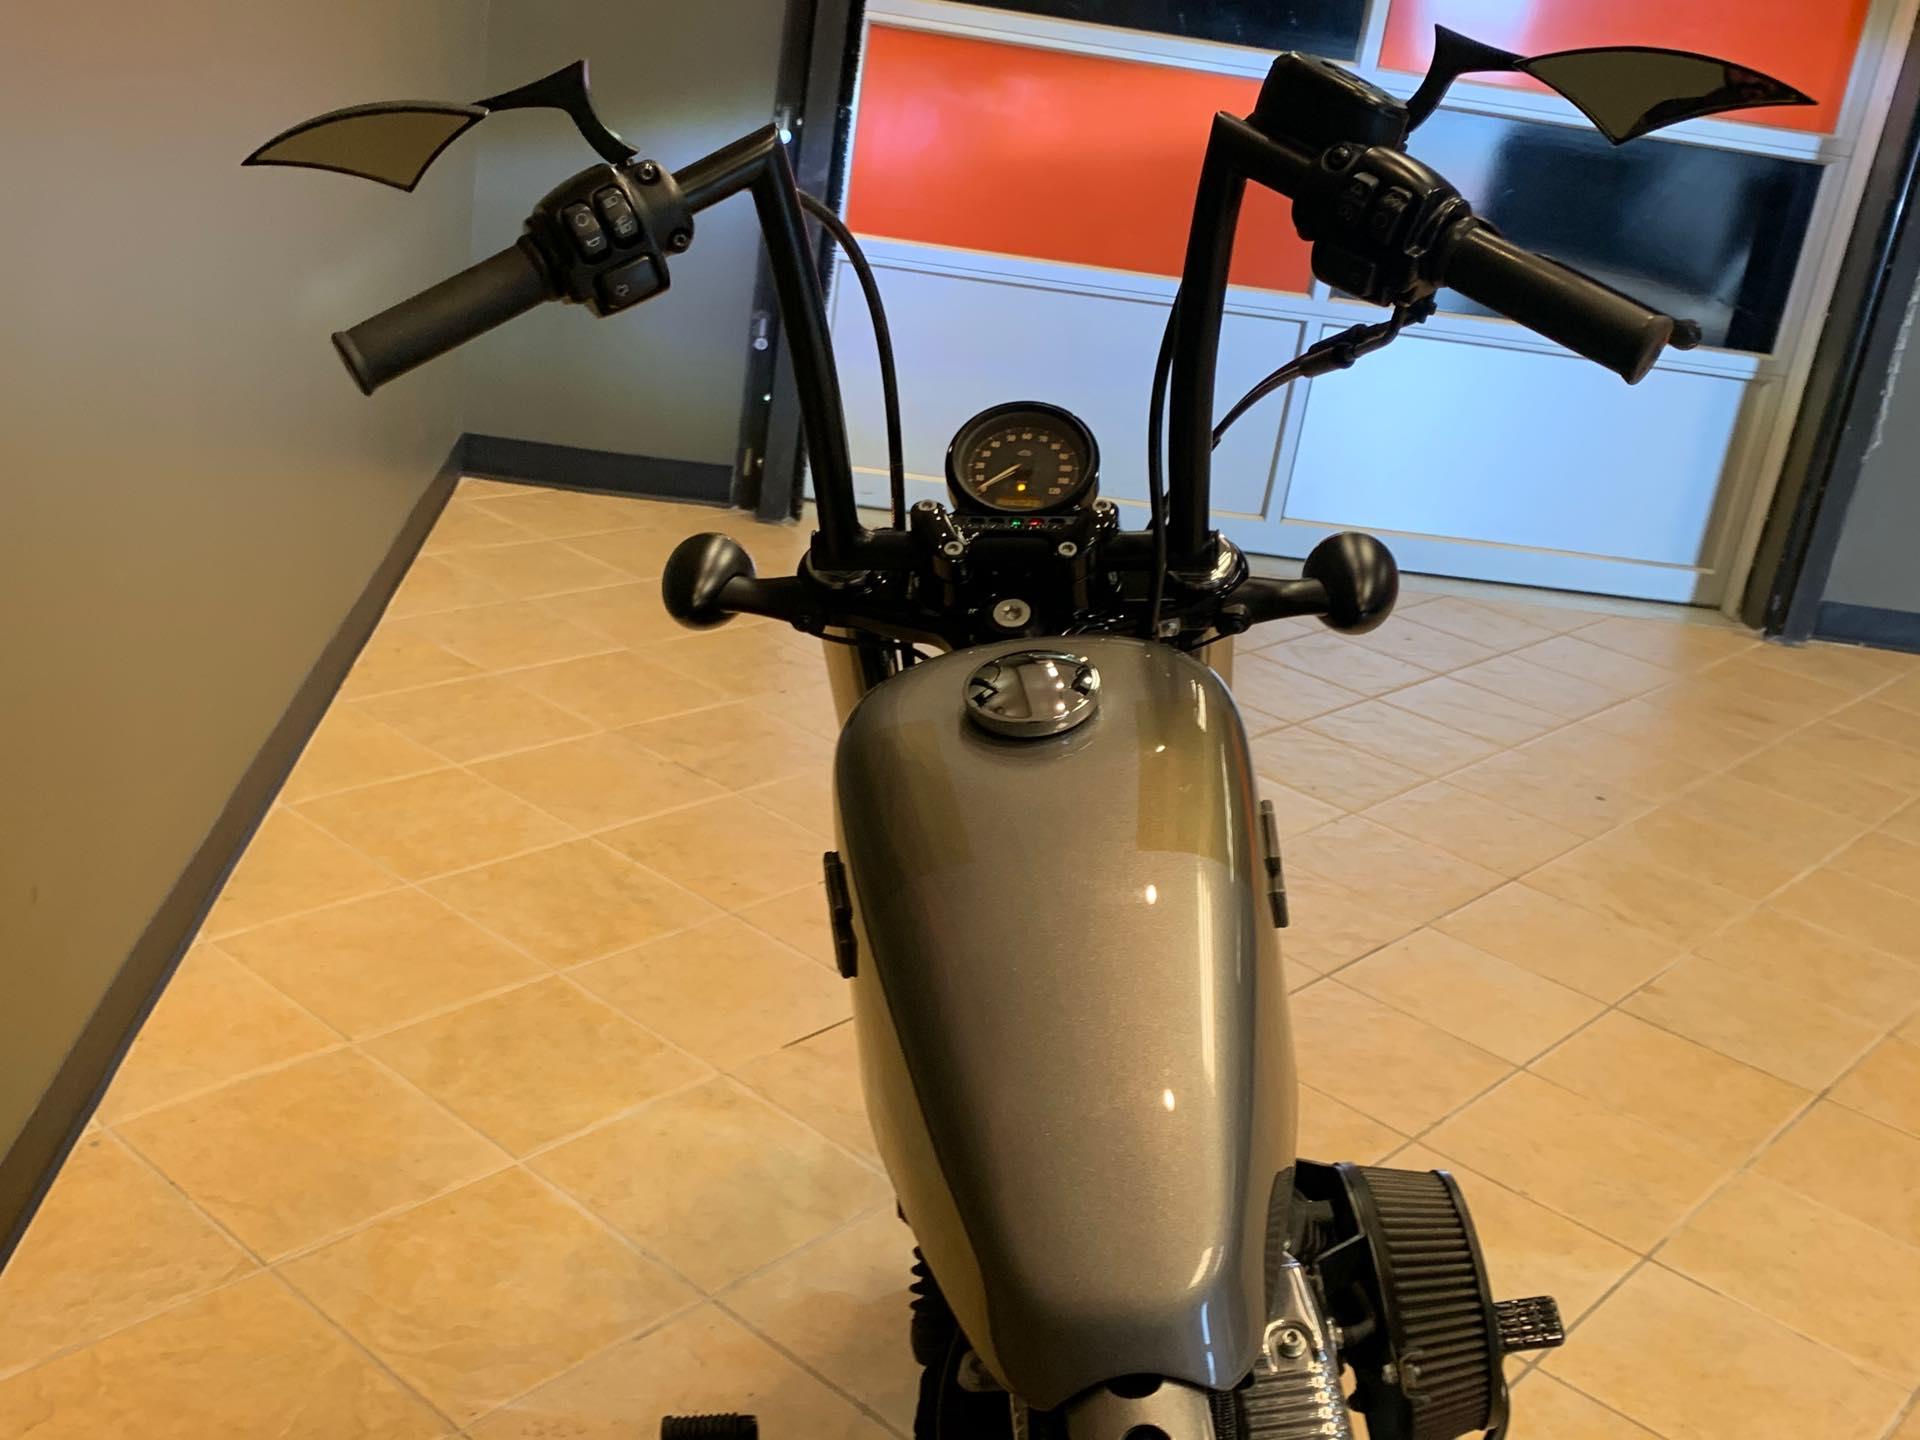 2016 Harley-Davidson Sportster Forty-Eight at Loess Hills Harley-Davidson